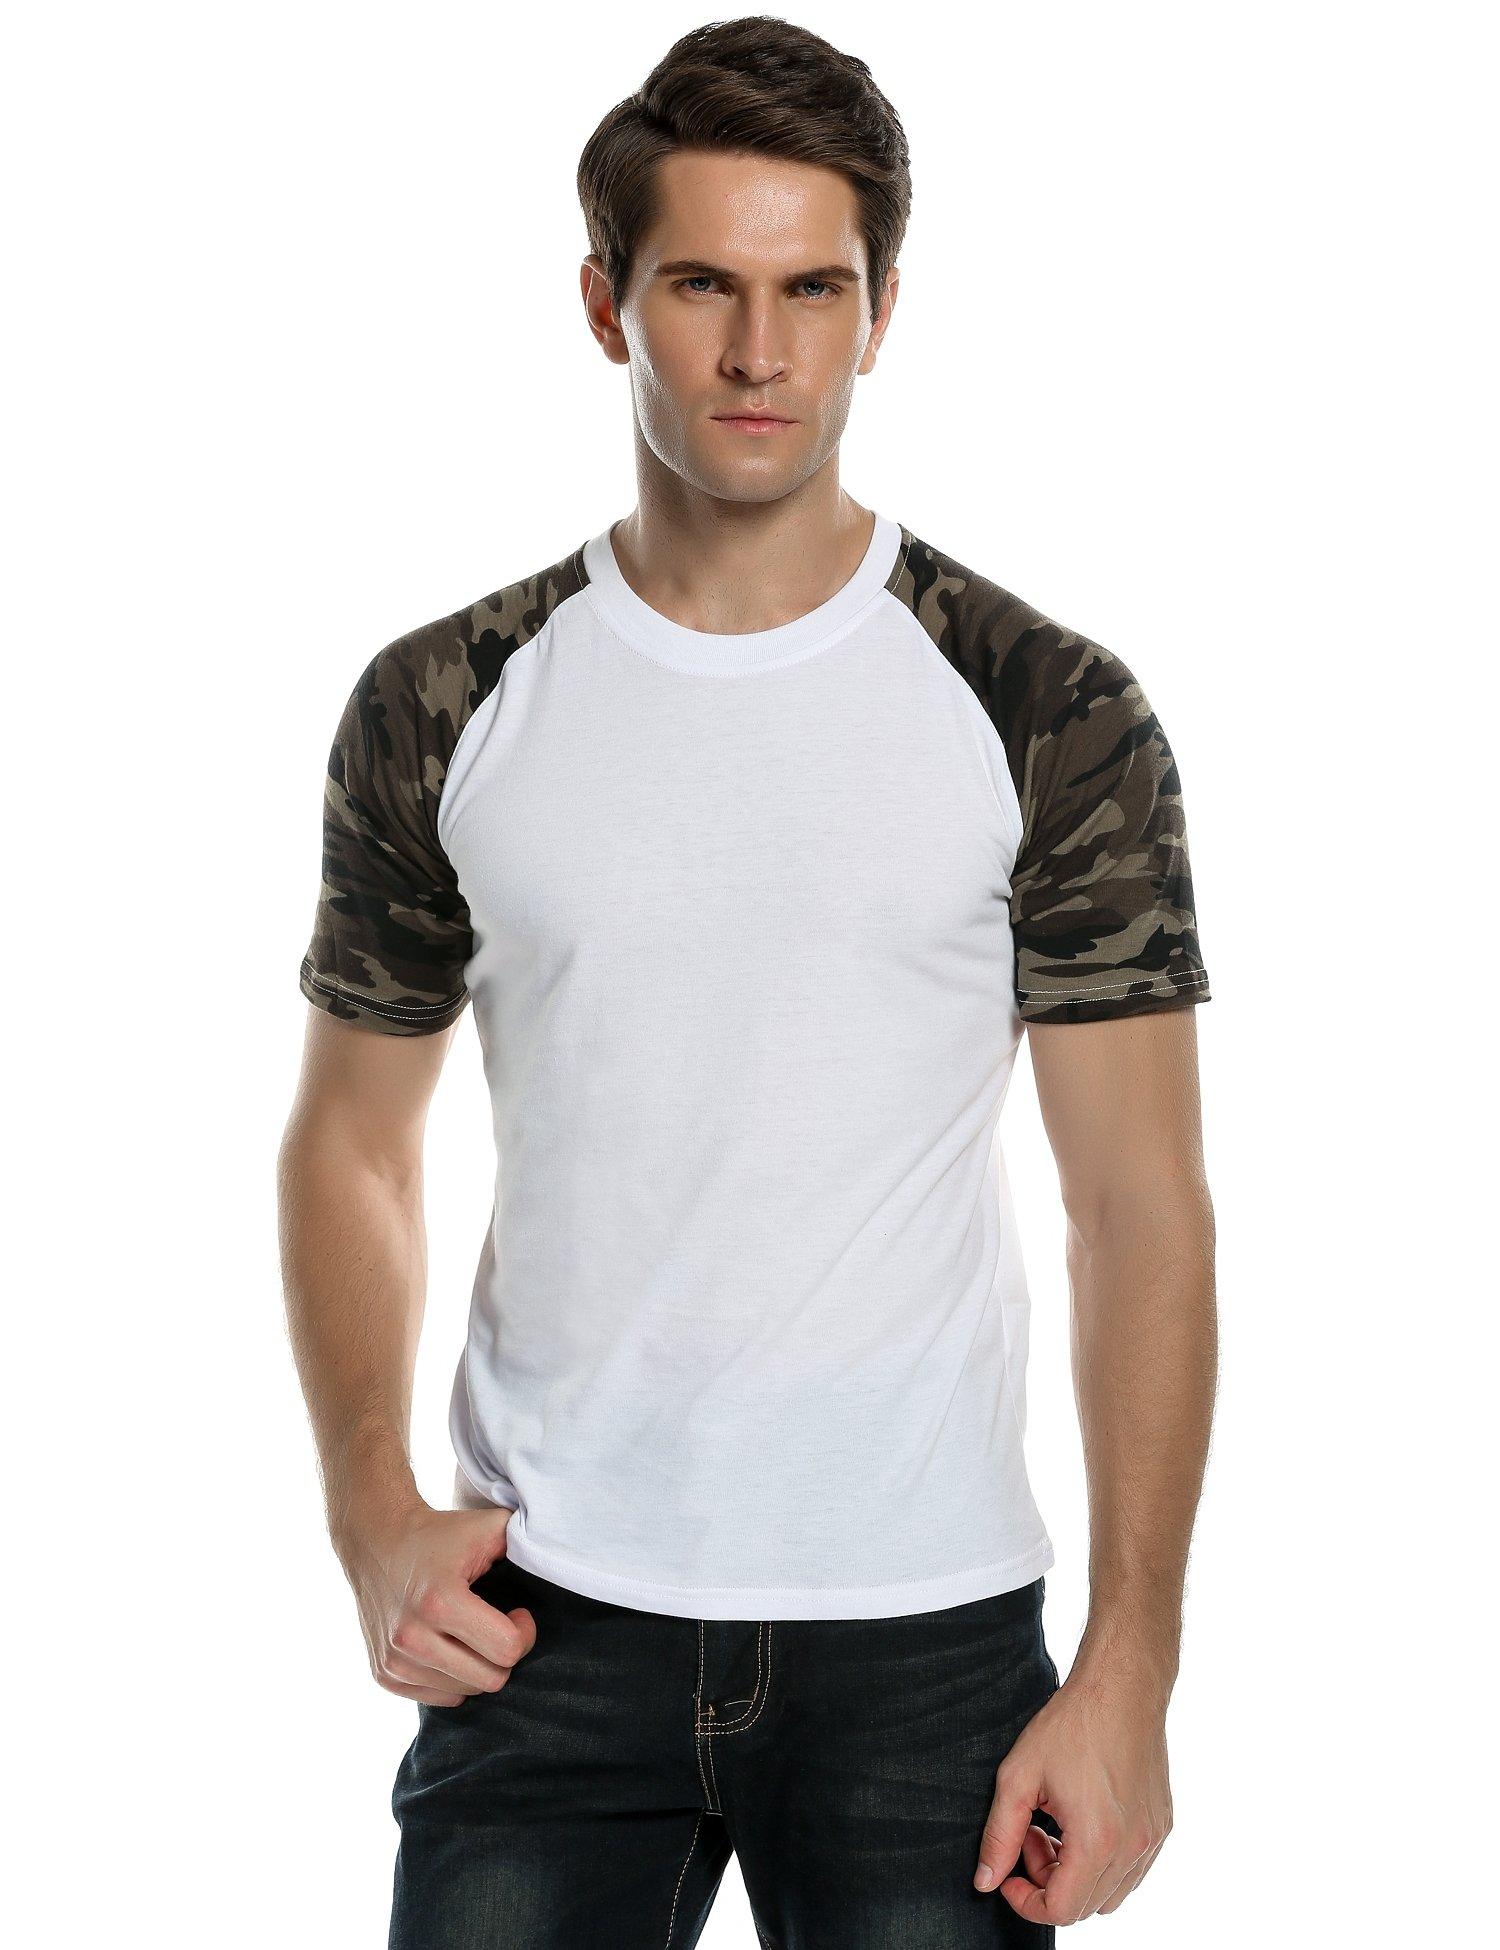 COOFANDY Mens Slim Fit Baseball Tee Short Sleeve Camo Printed Raglan t  Shirt product image ec5a13c4d40